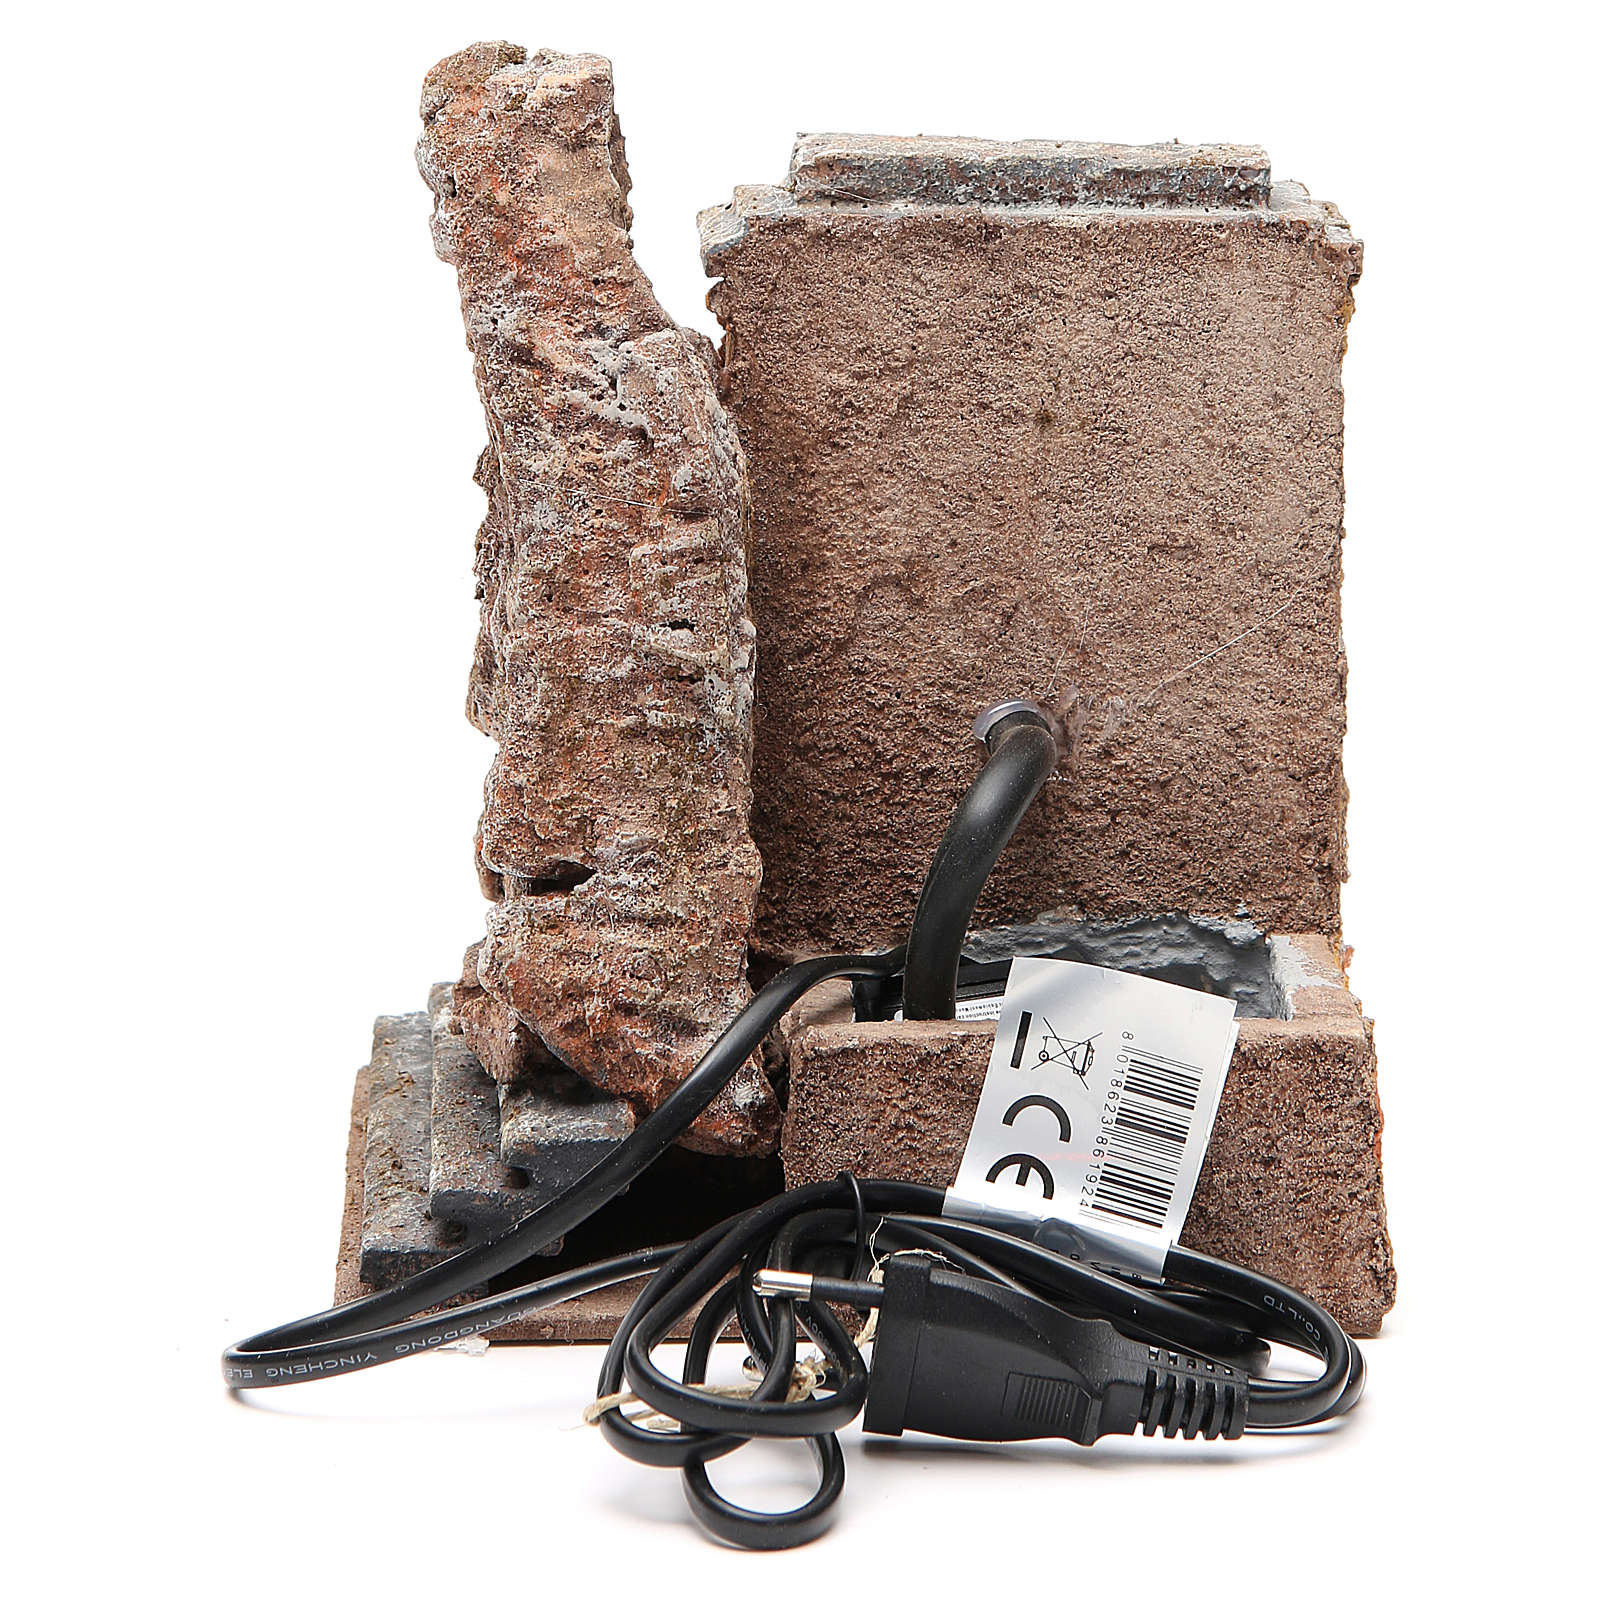 Fuente eléctrica belén roca 18x16x16 cm 4